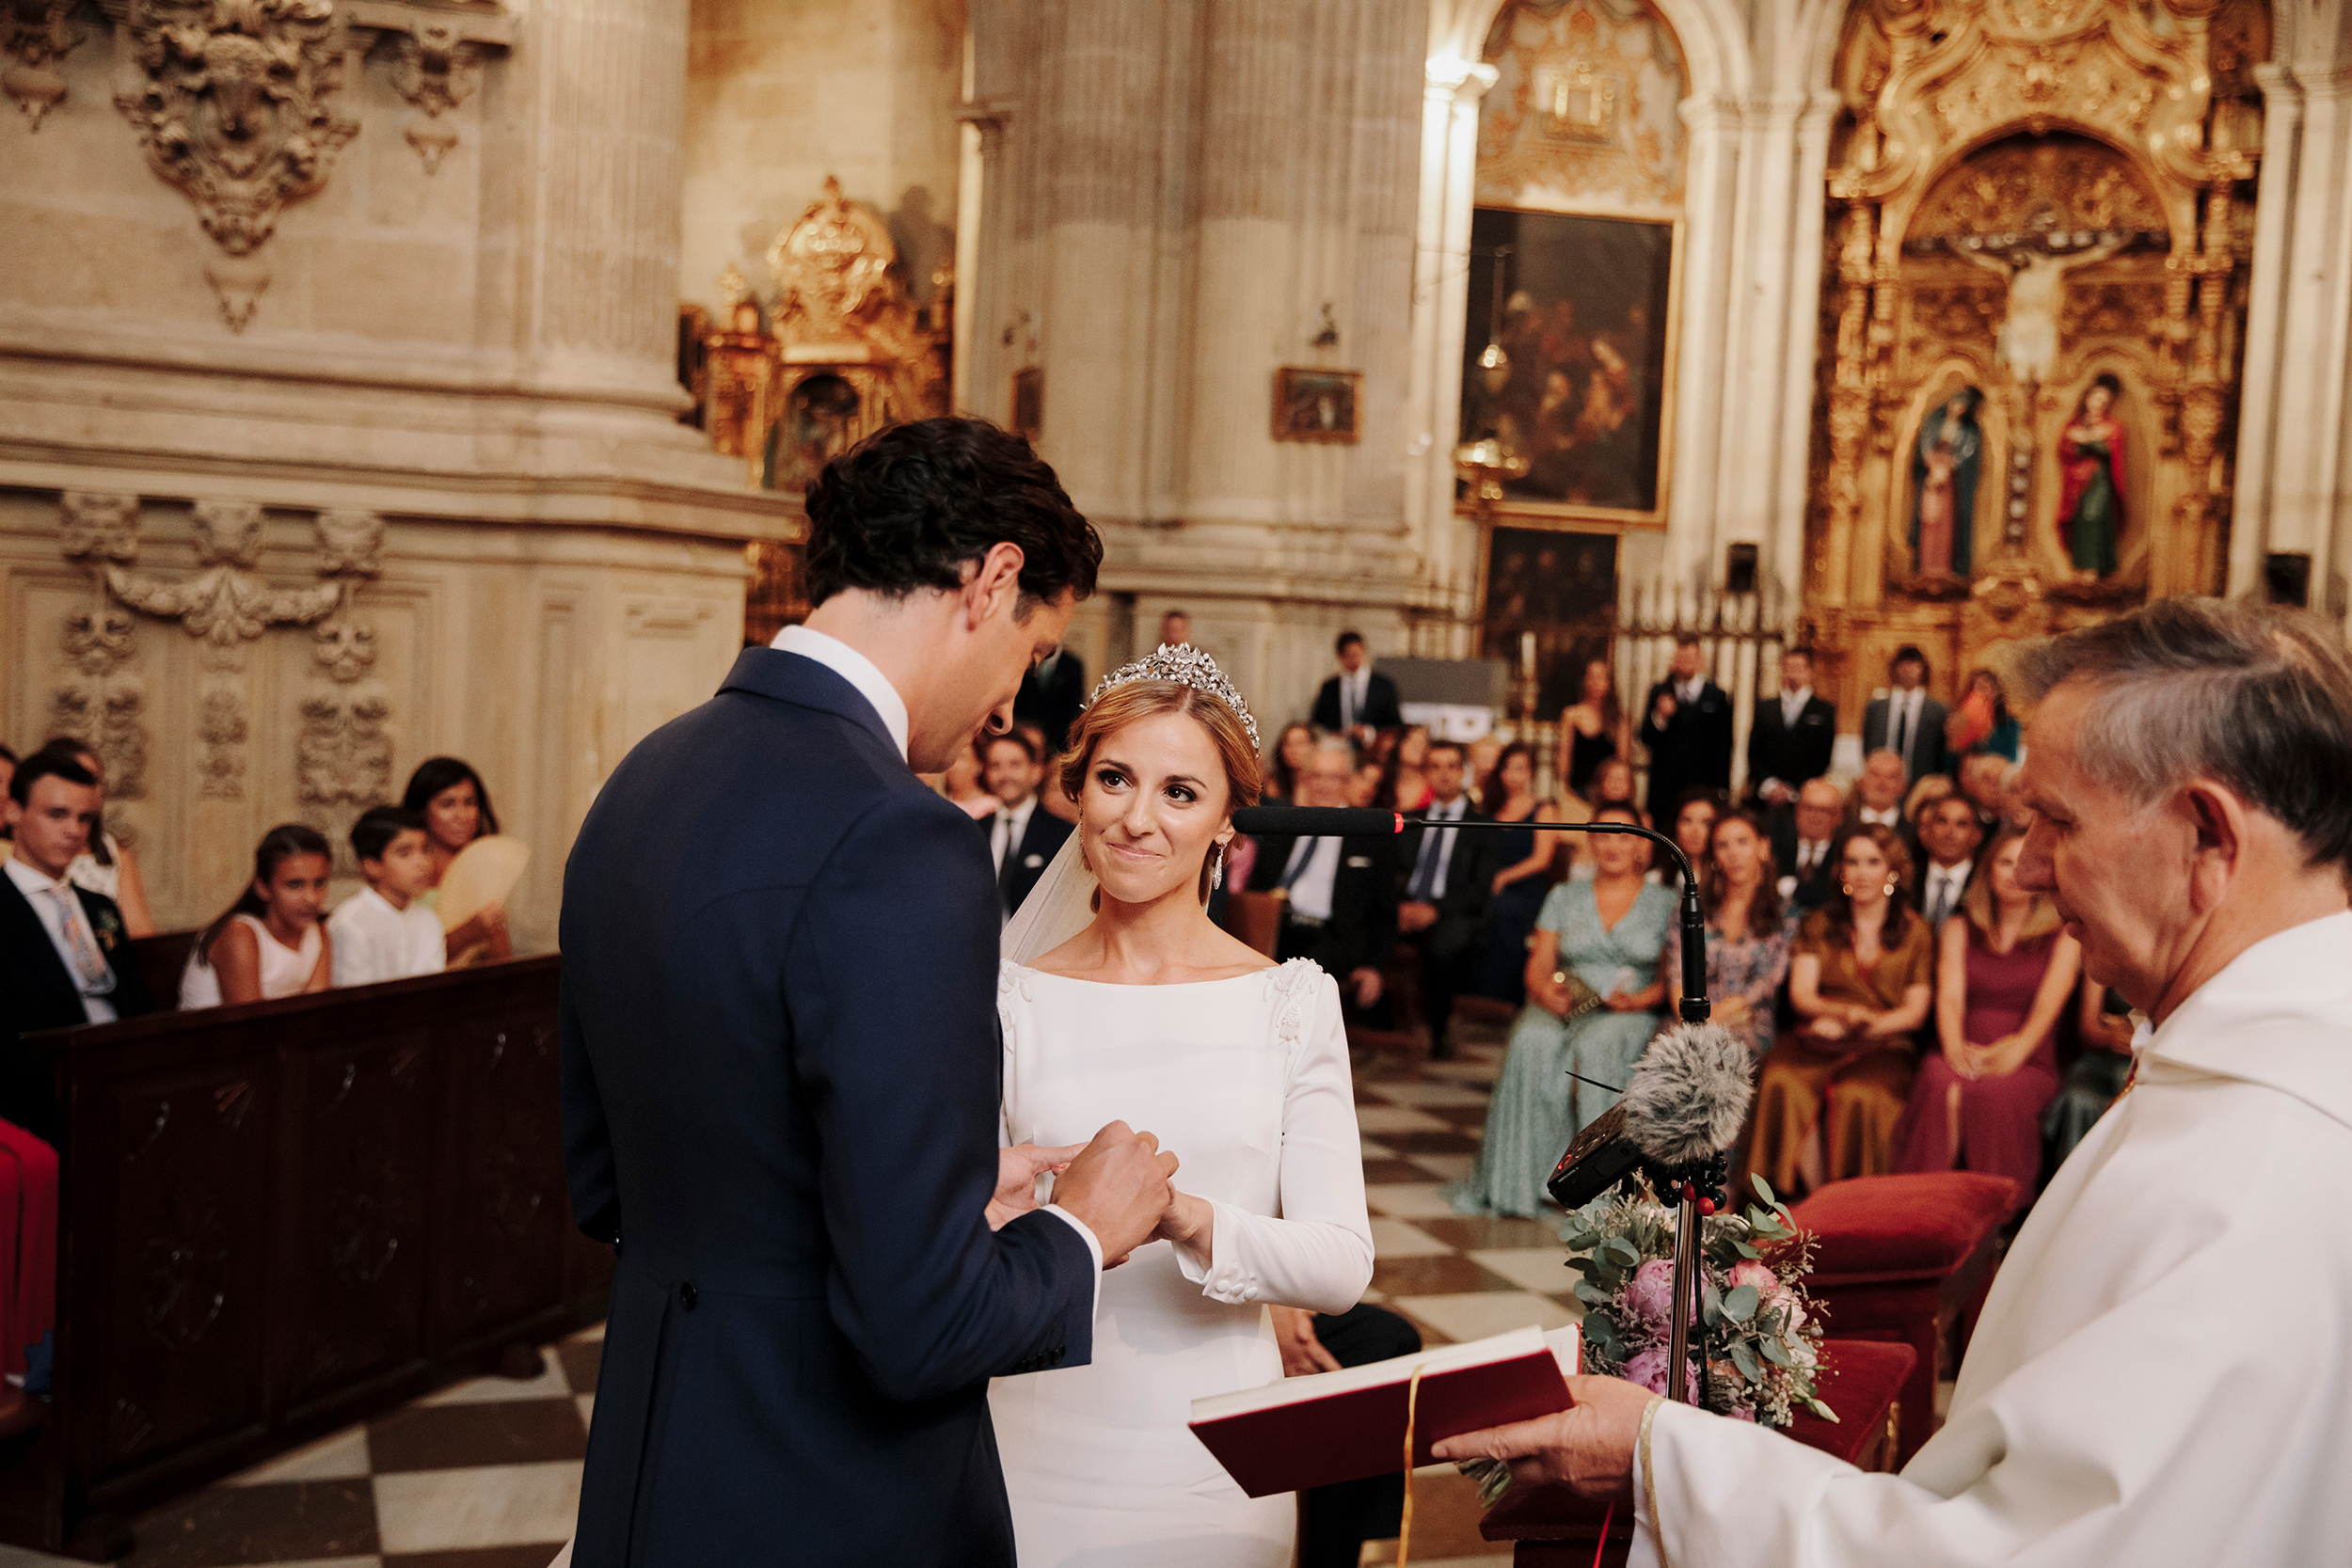 fotografo-bodas-granada-catedral-sagrario-jose-reyes_041.jpg